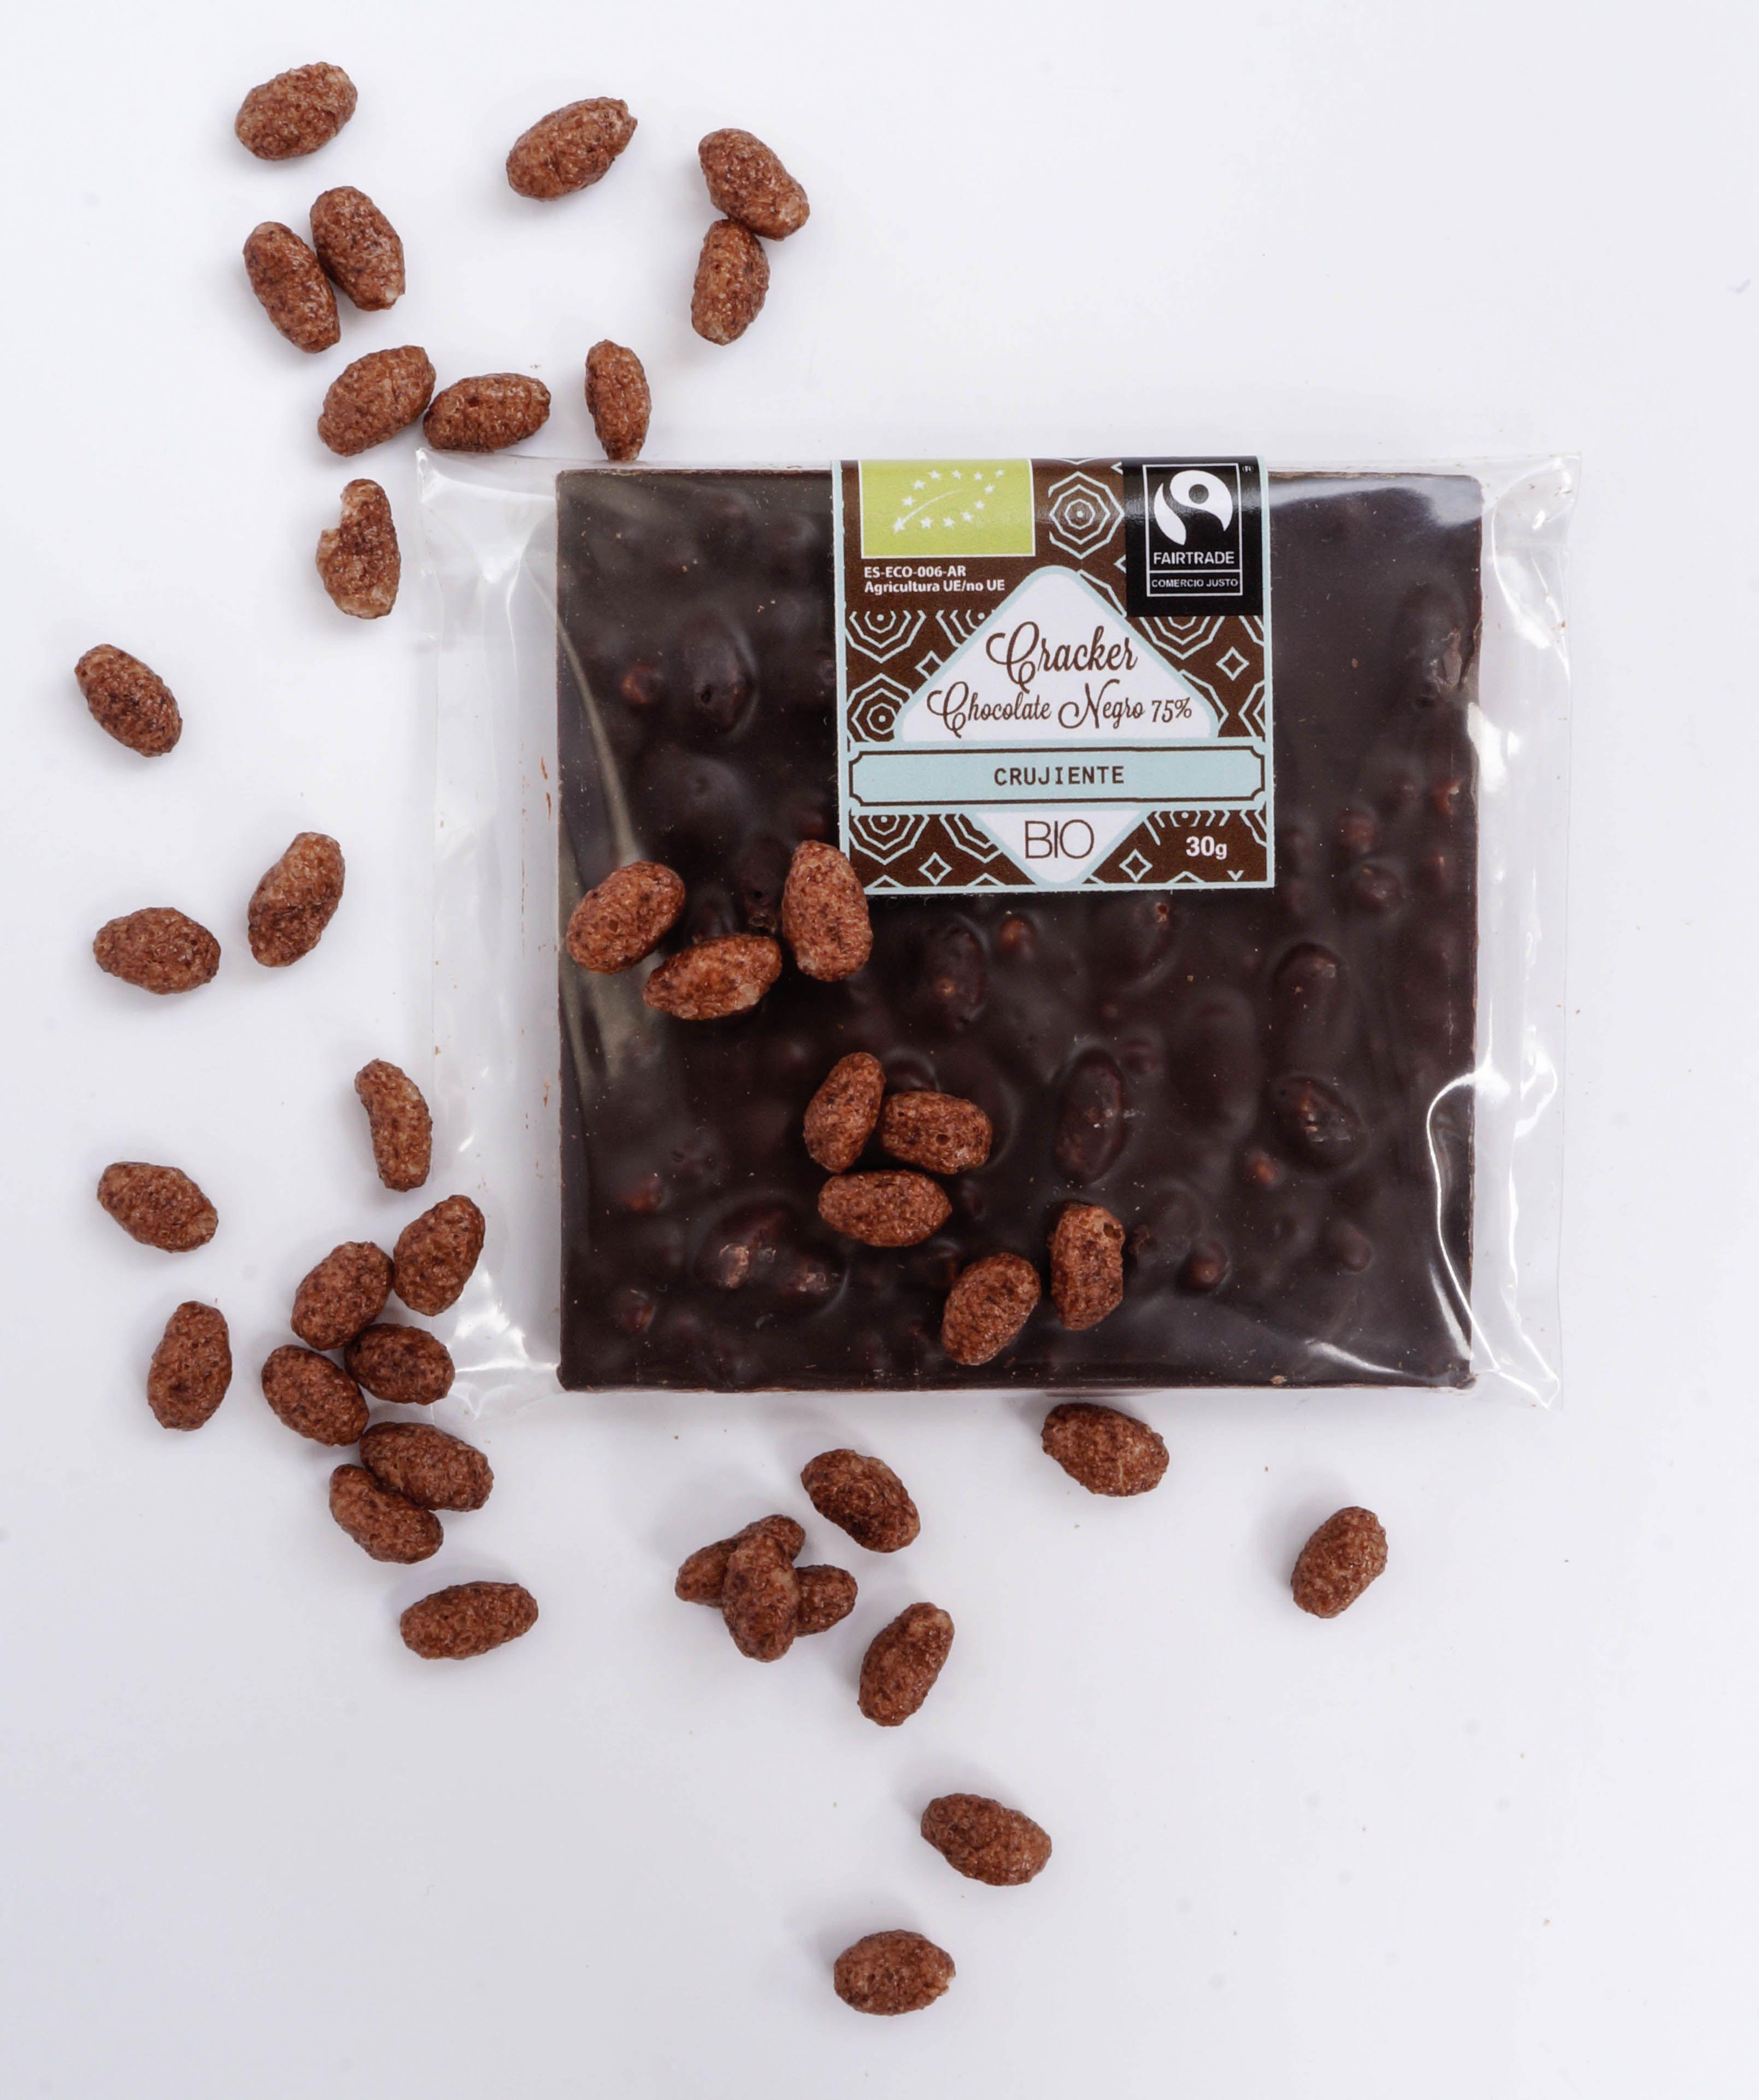 Cracker BIO de Chocolate Negro Crujiente